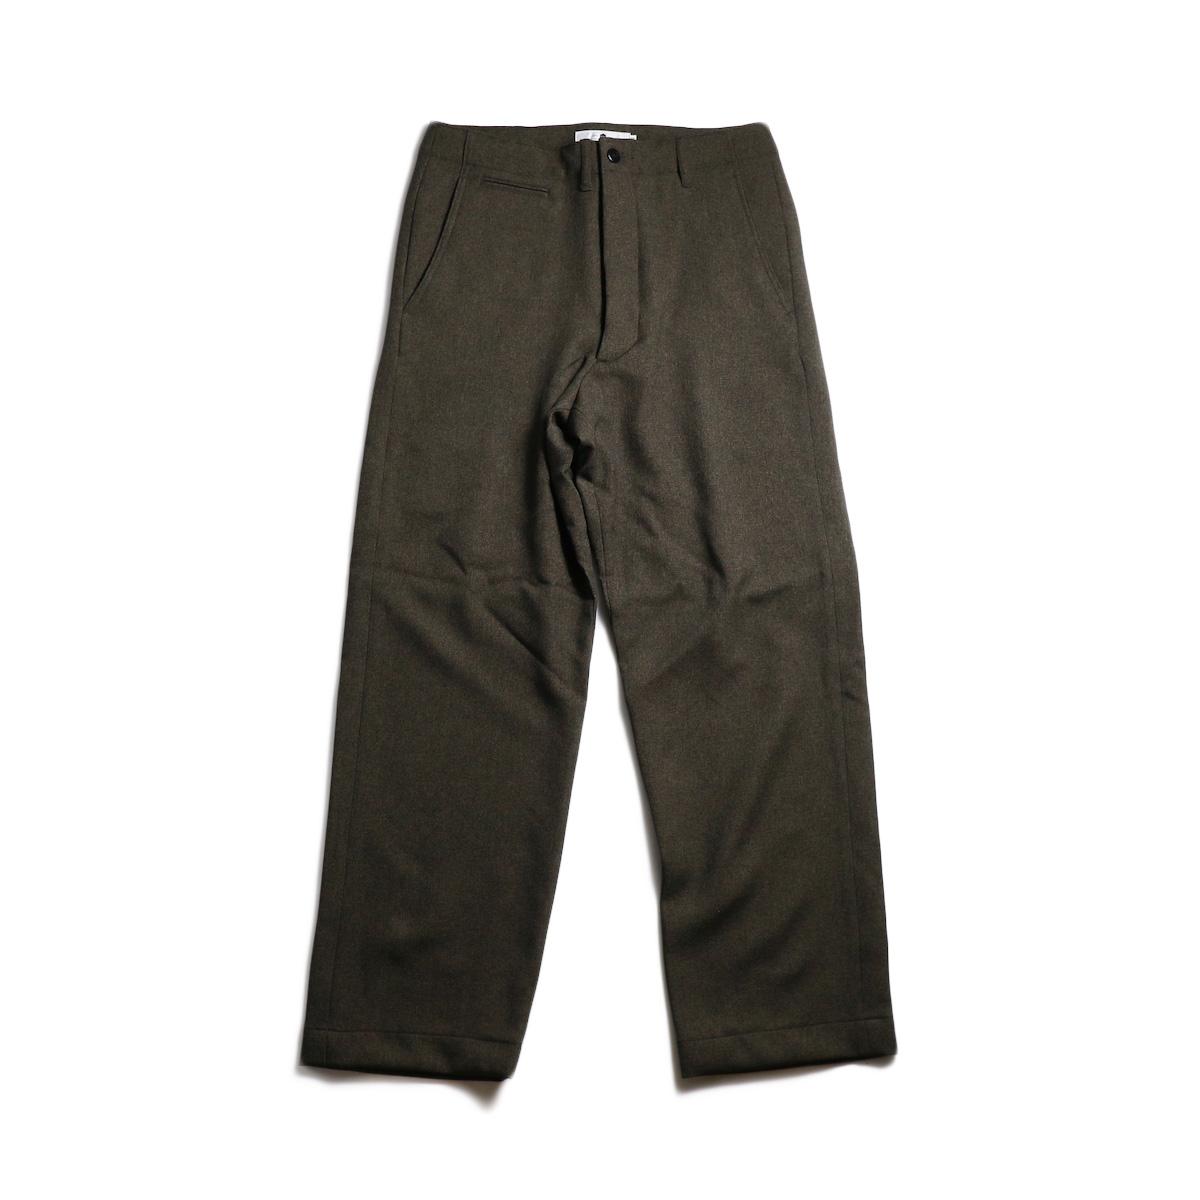 SGGM / M-17 Poly Trouser (Brown Mix)